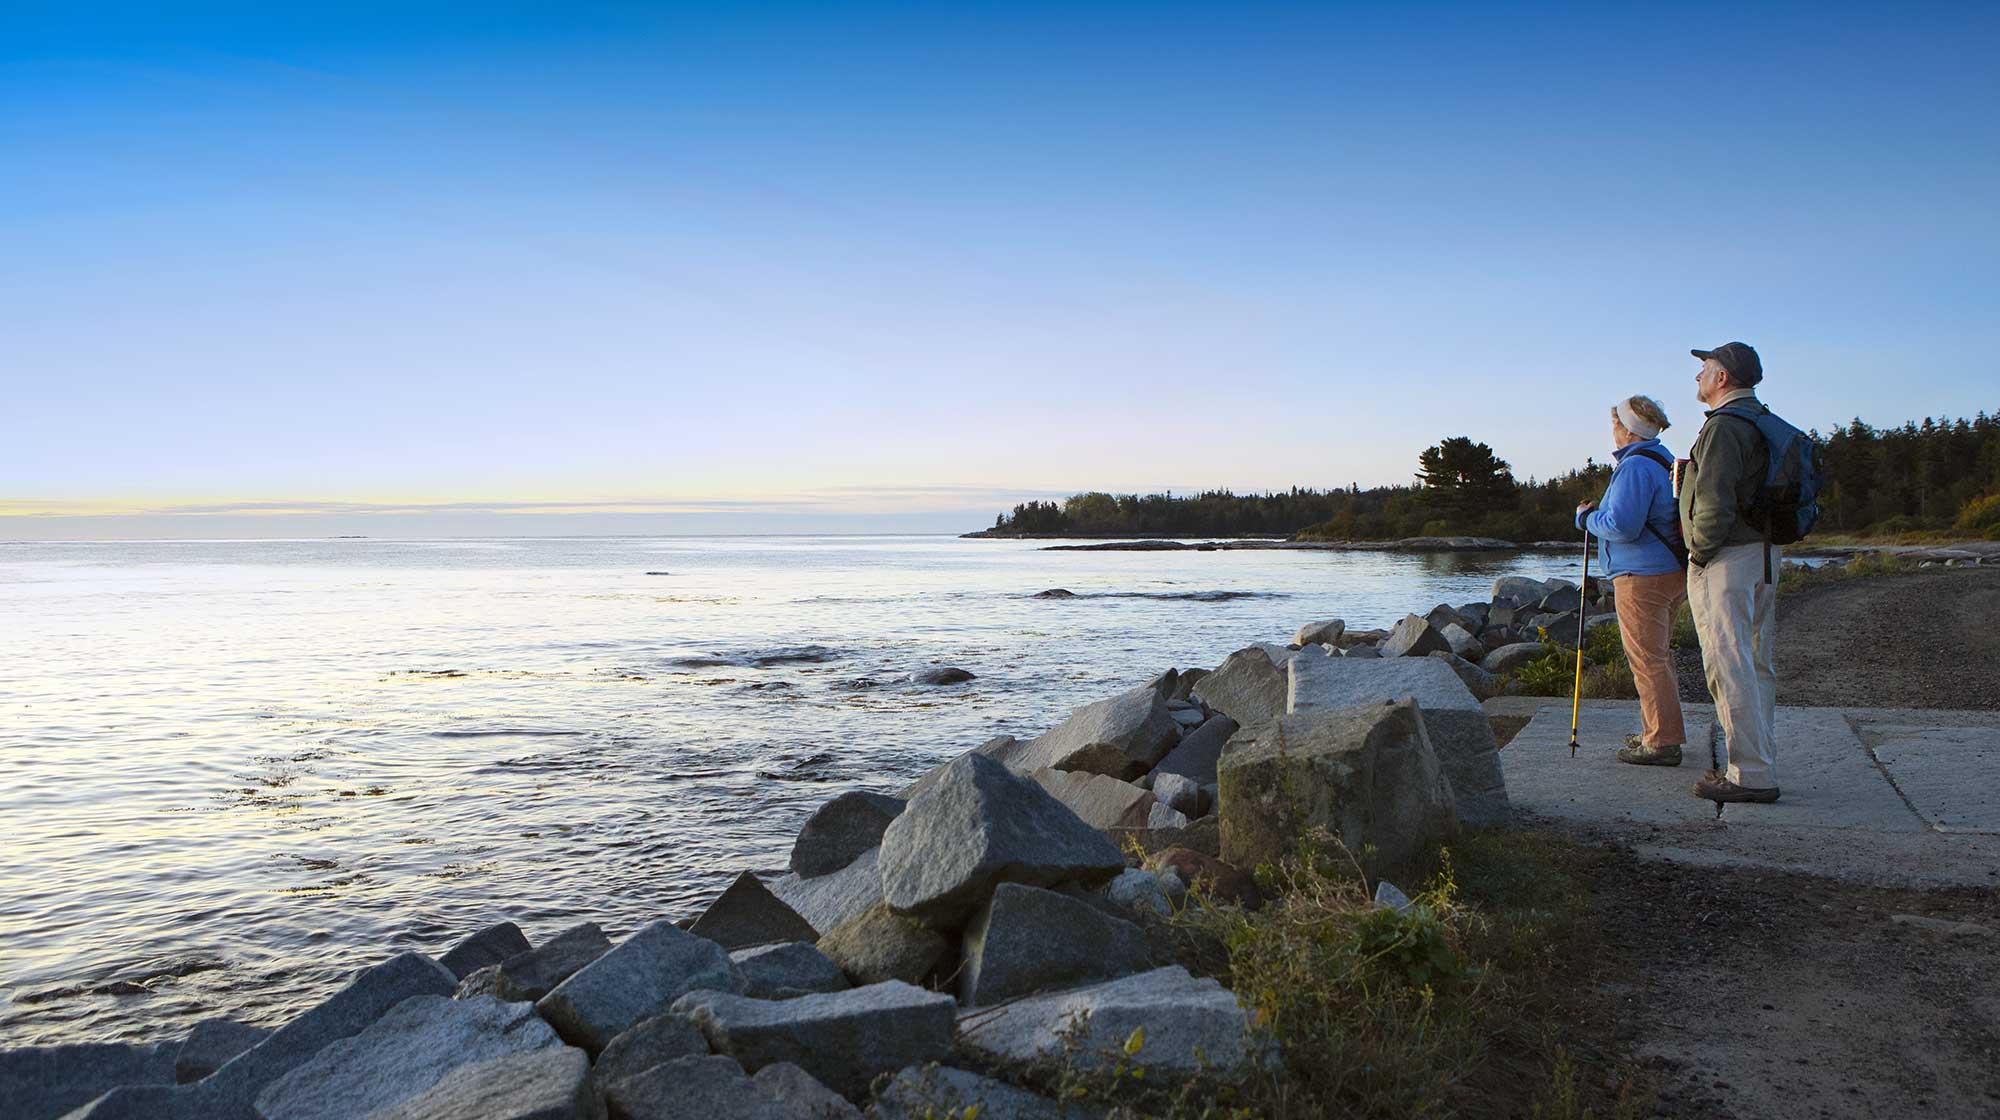 Photo from Clark Island, copyright Amanda Kowalski